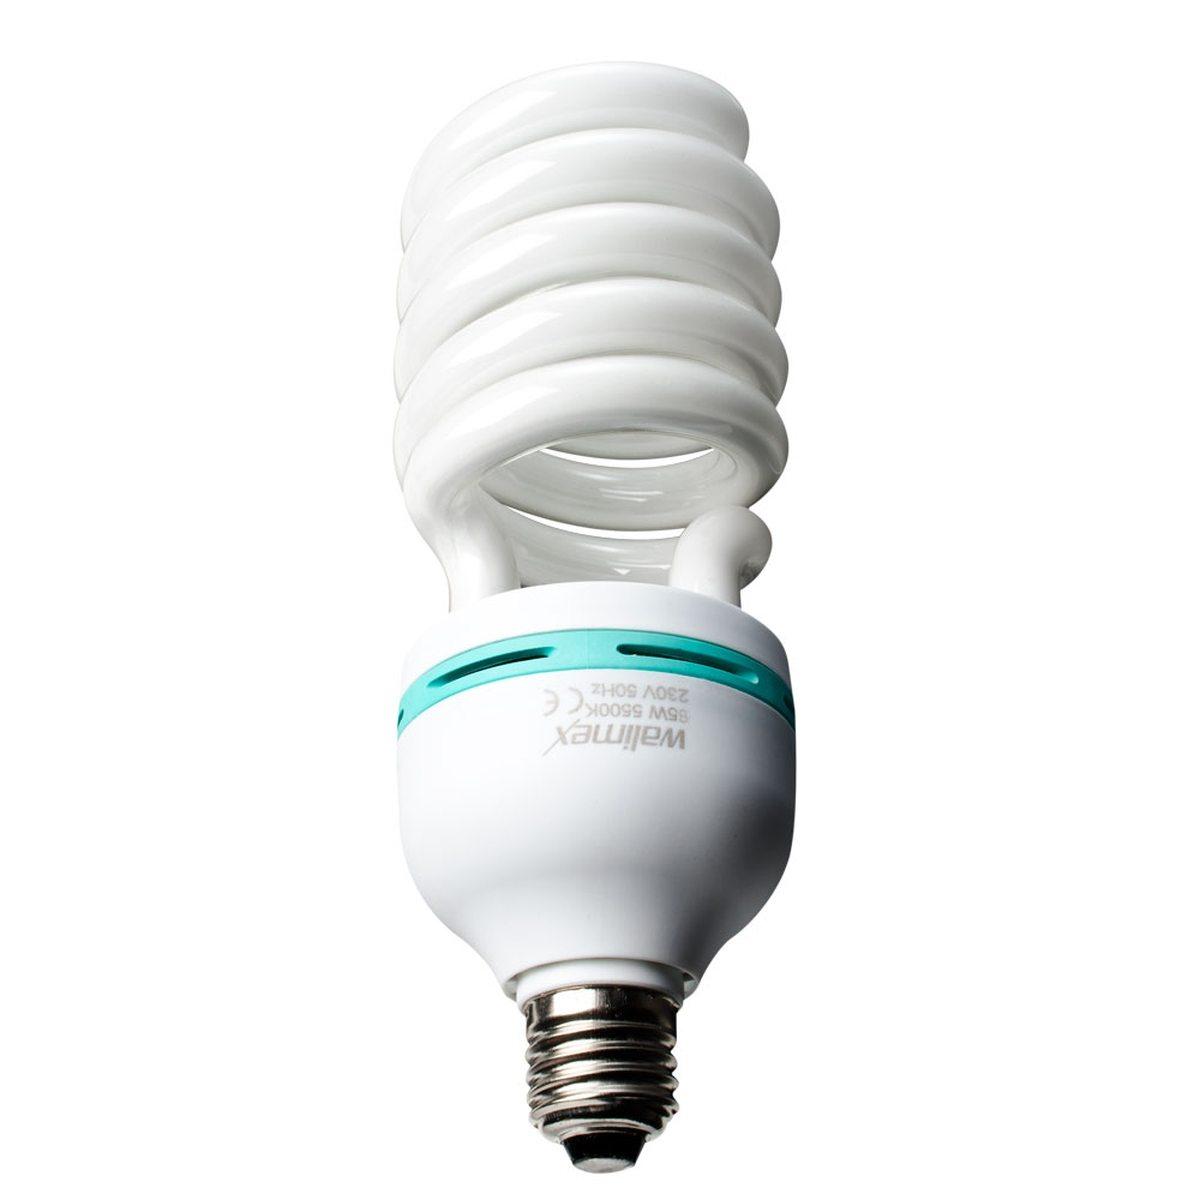 Walimex Daylight Spiral Lamp 85W equates 450W